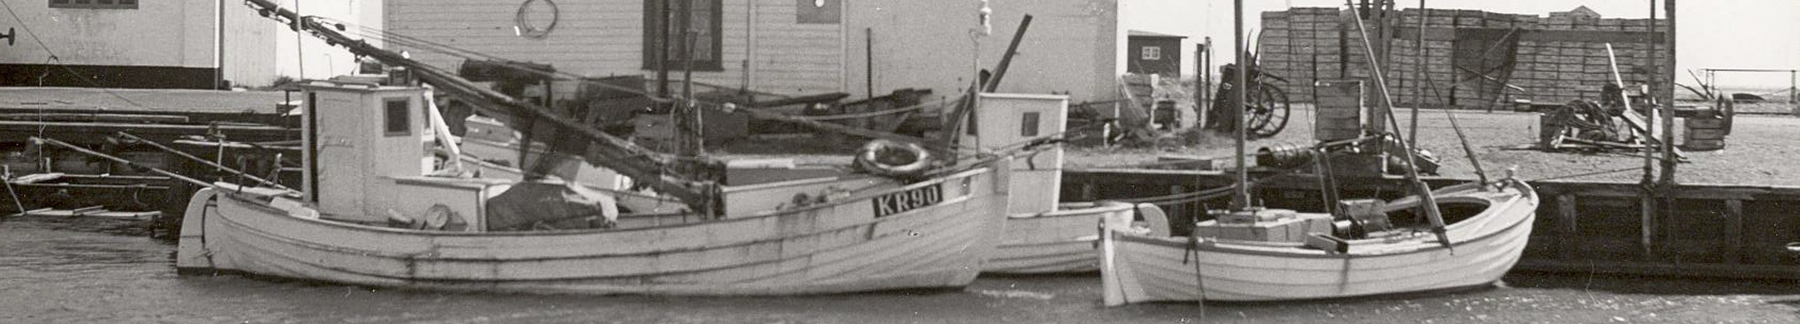 Juelsminde Havnemuseum